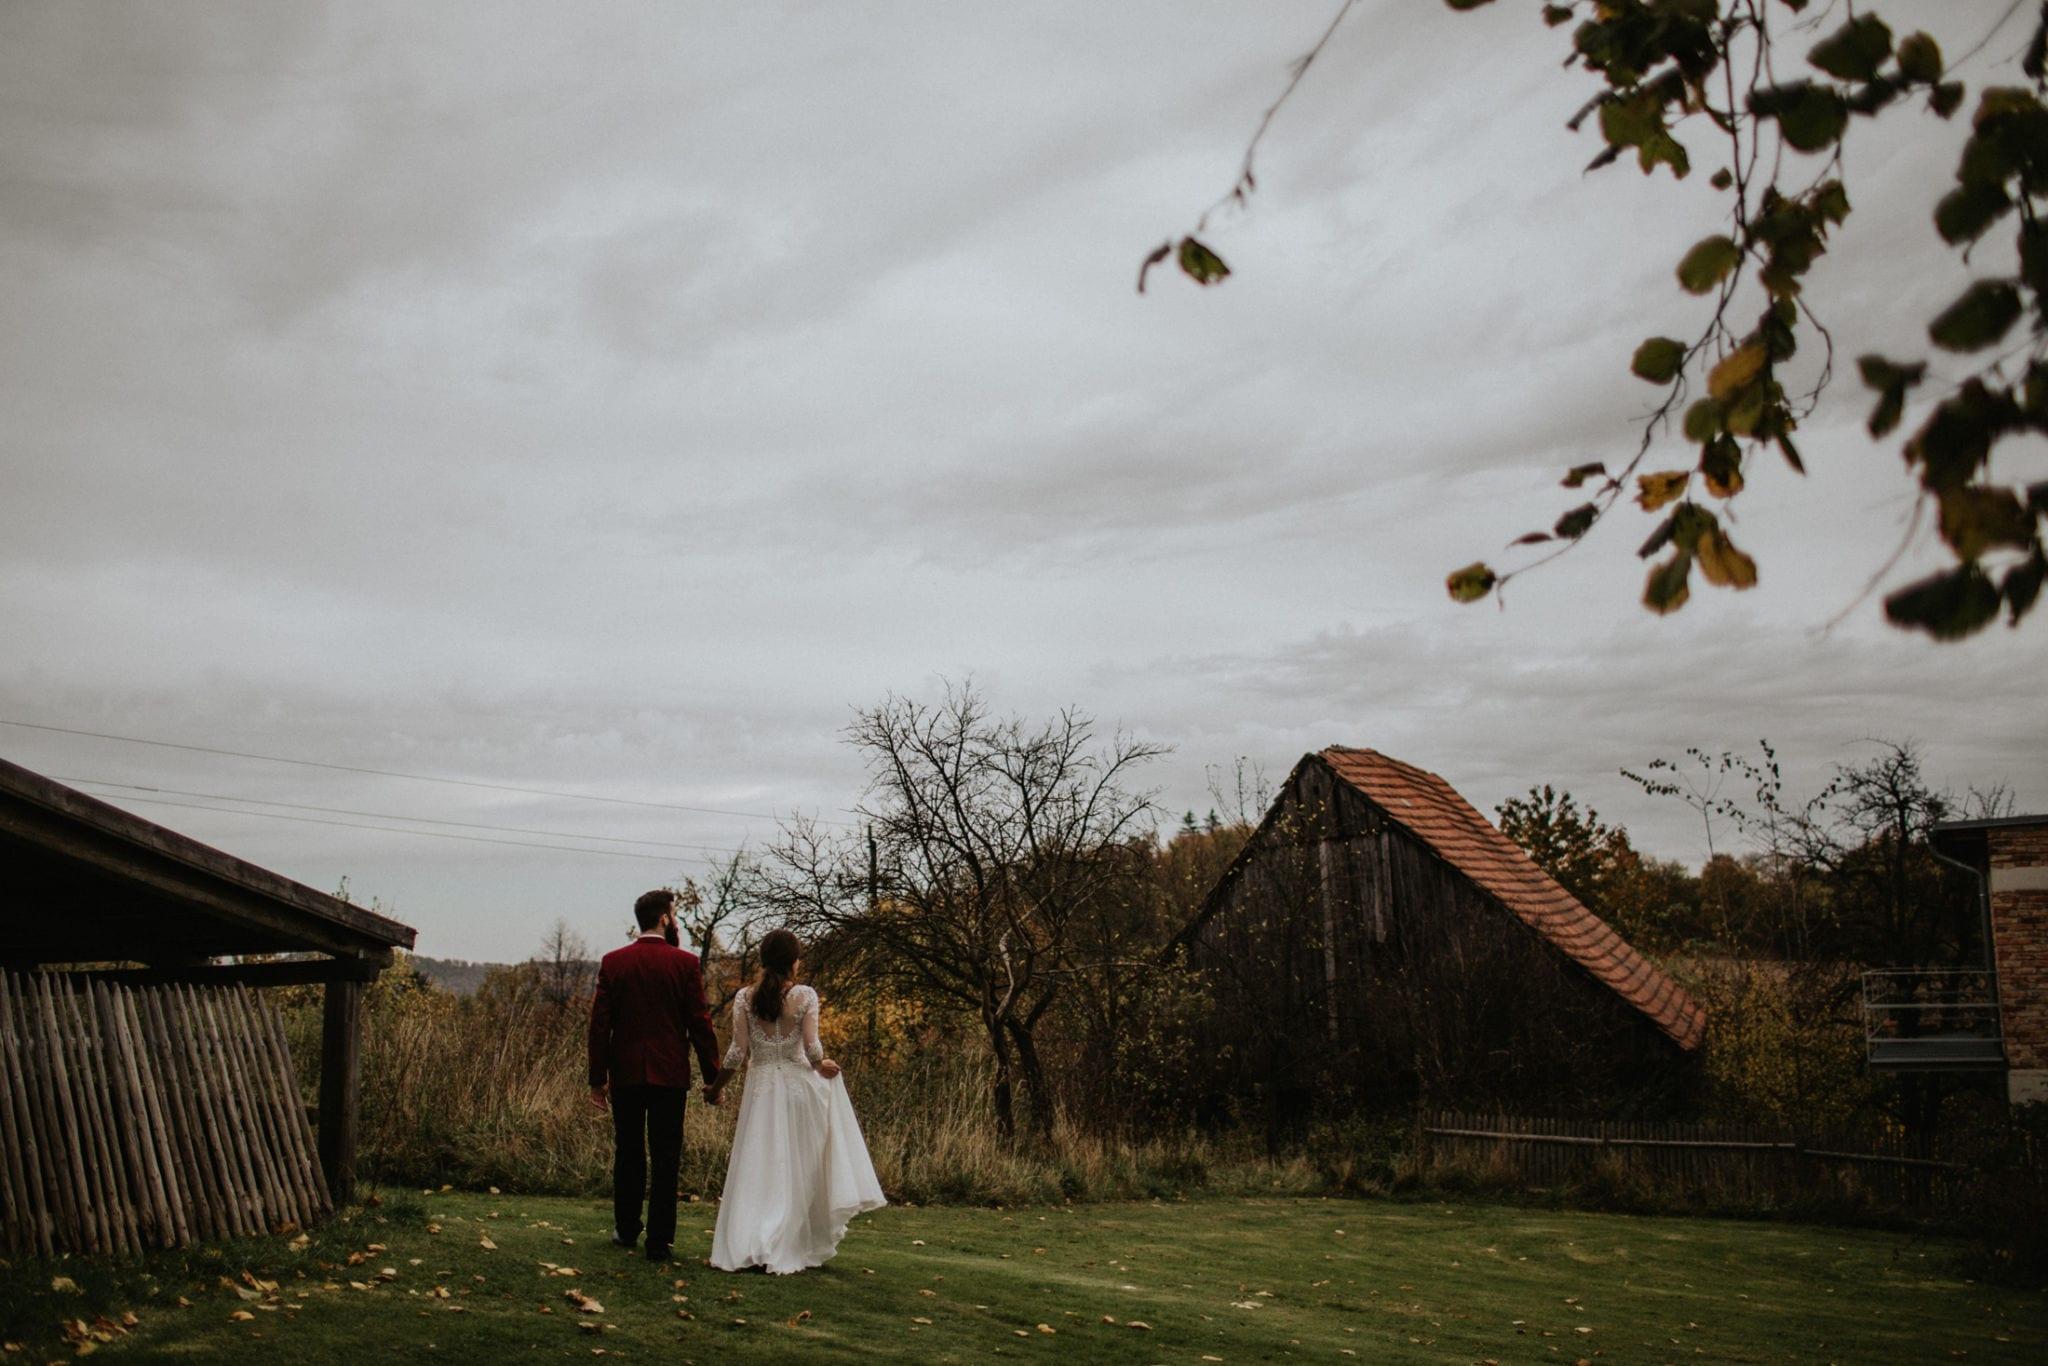 Sylwia & Konrad <br>Sesja ślubna na Dolnym Śląsku 29